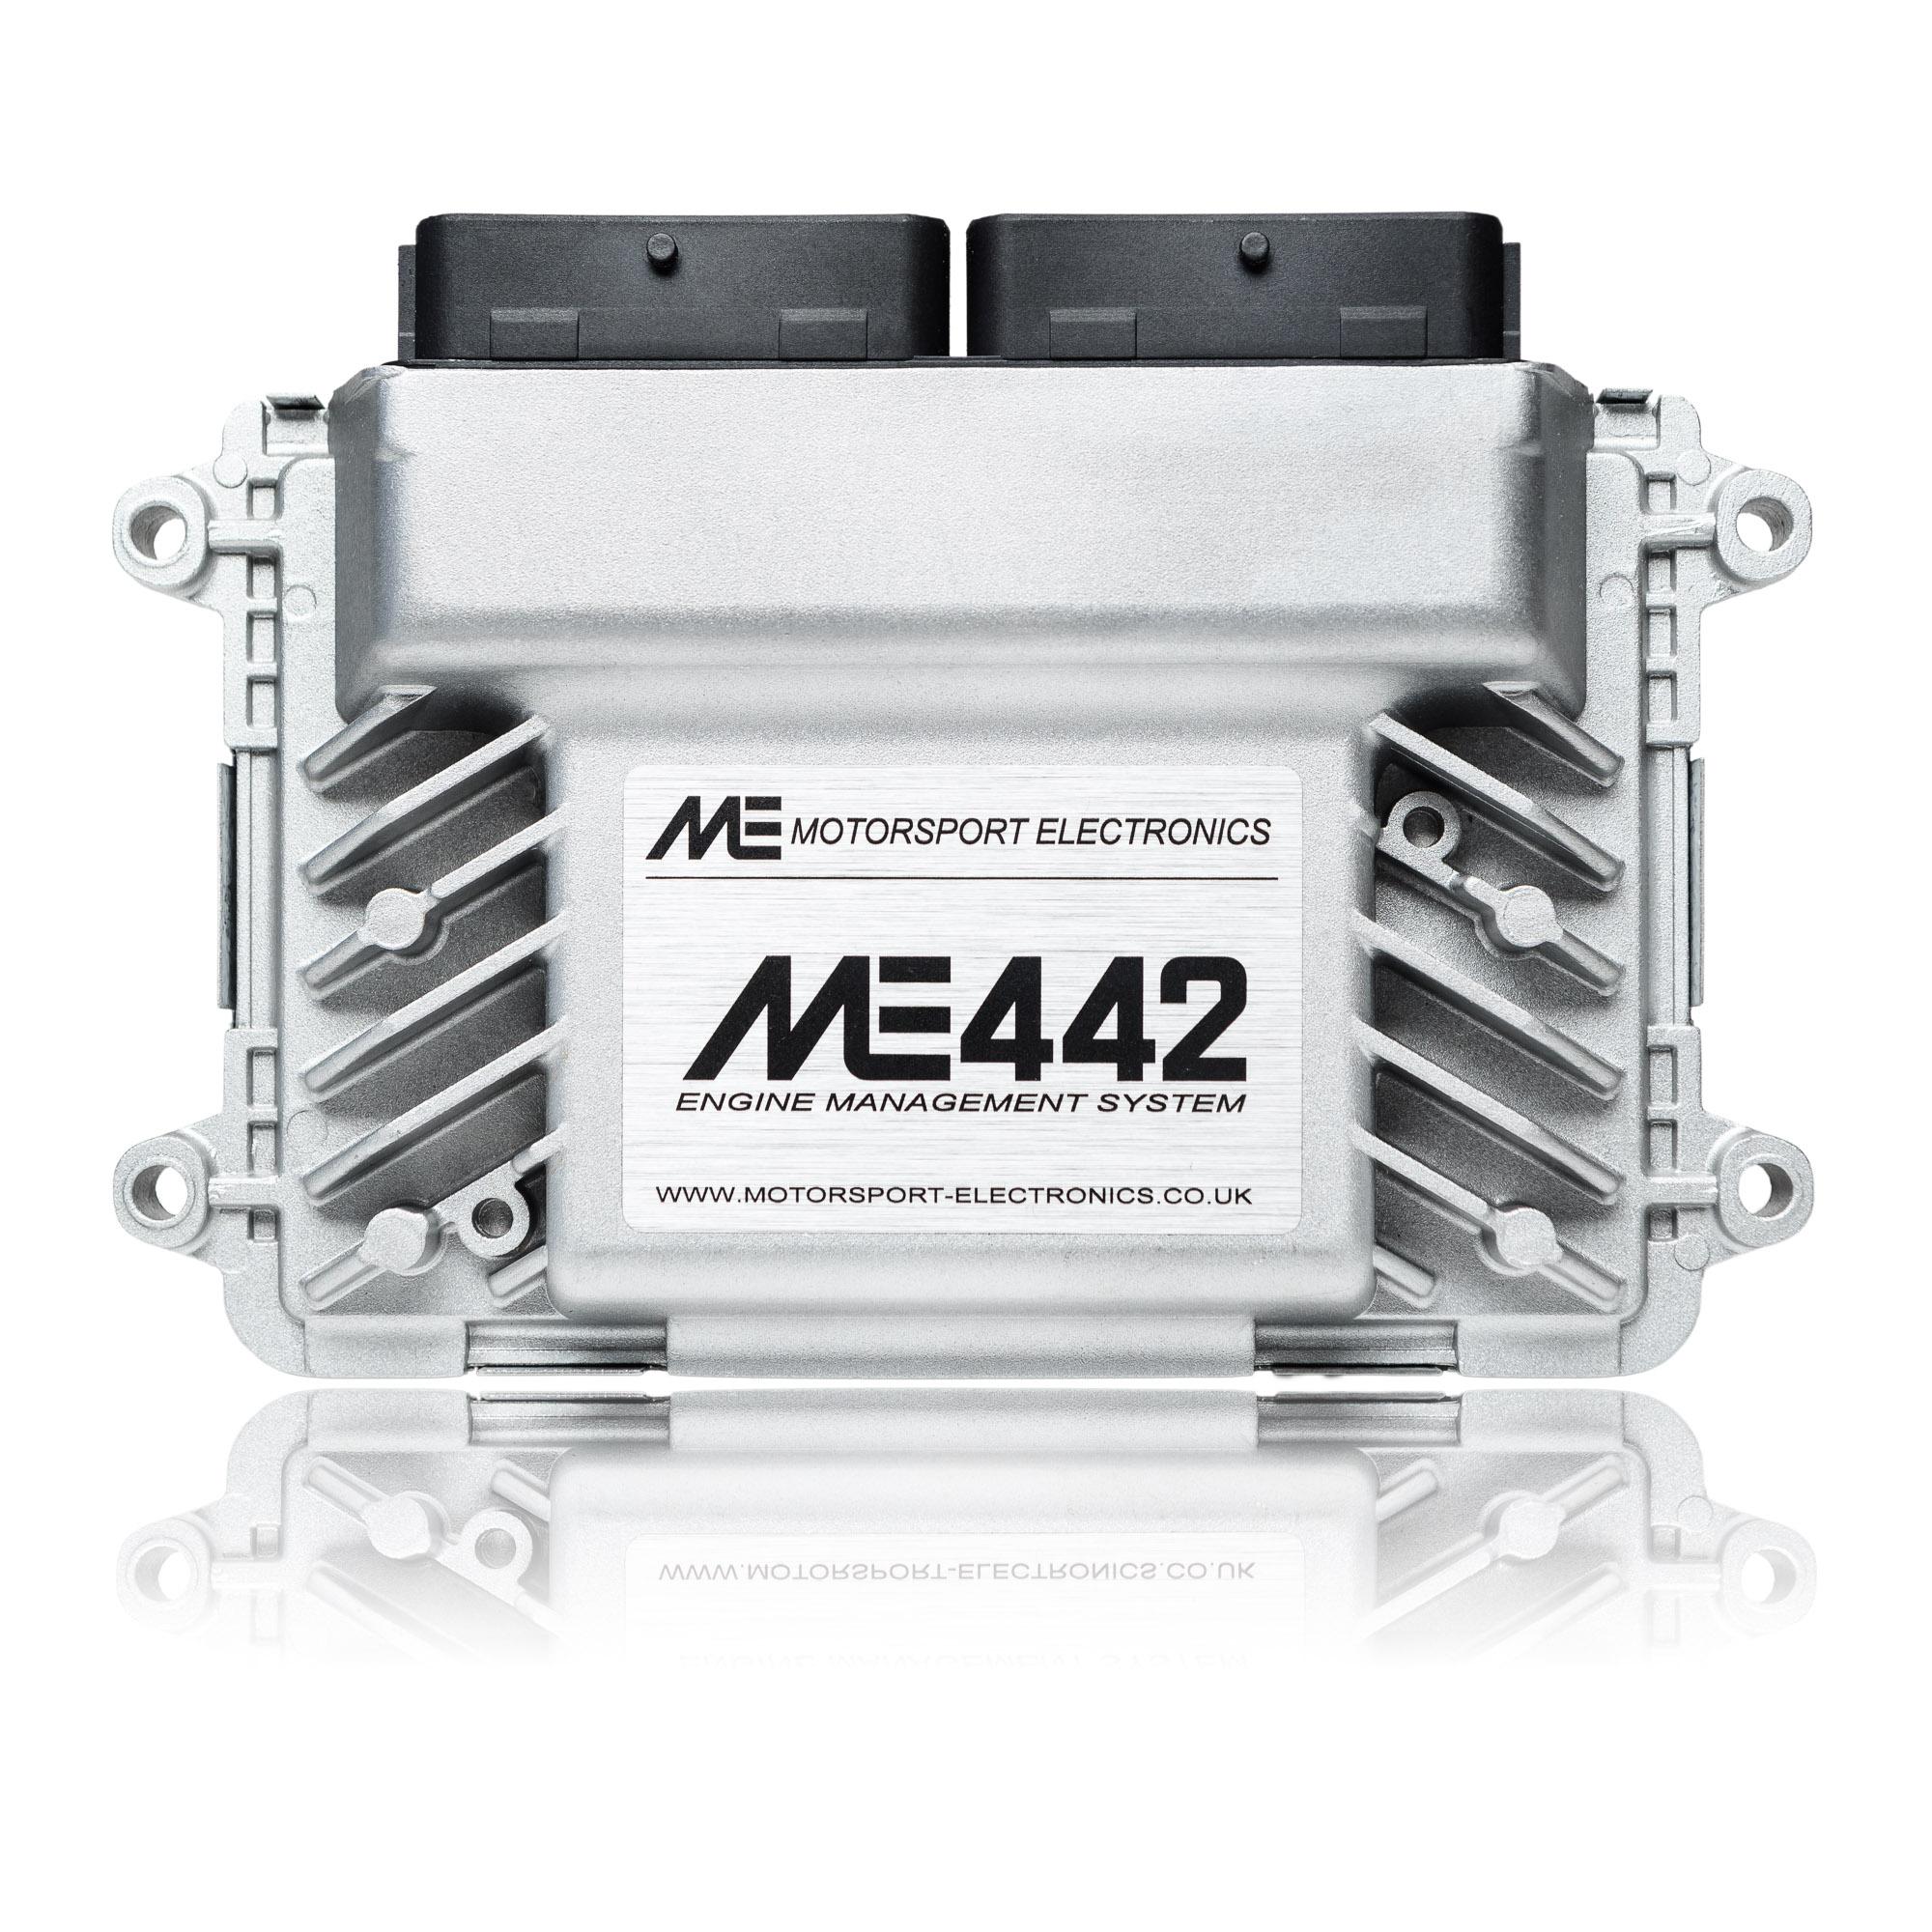 Motorsport-Electronics car tuning